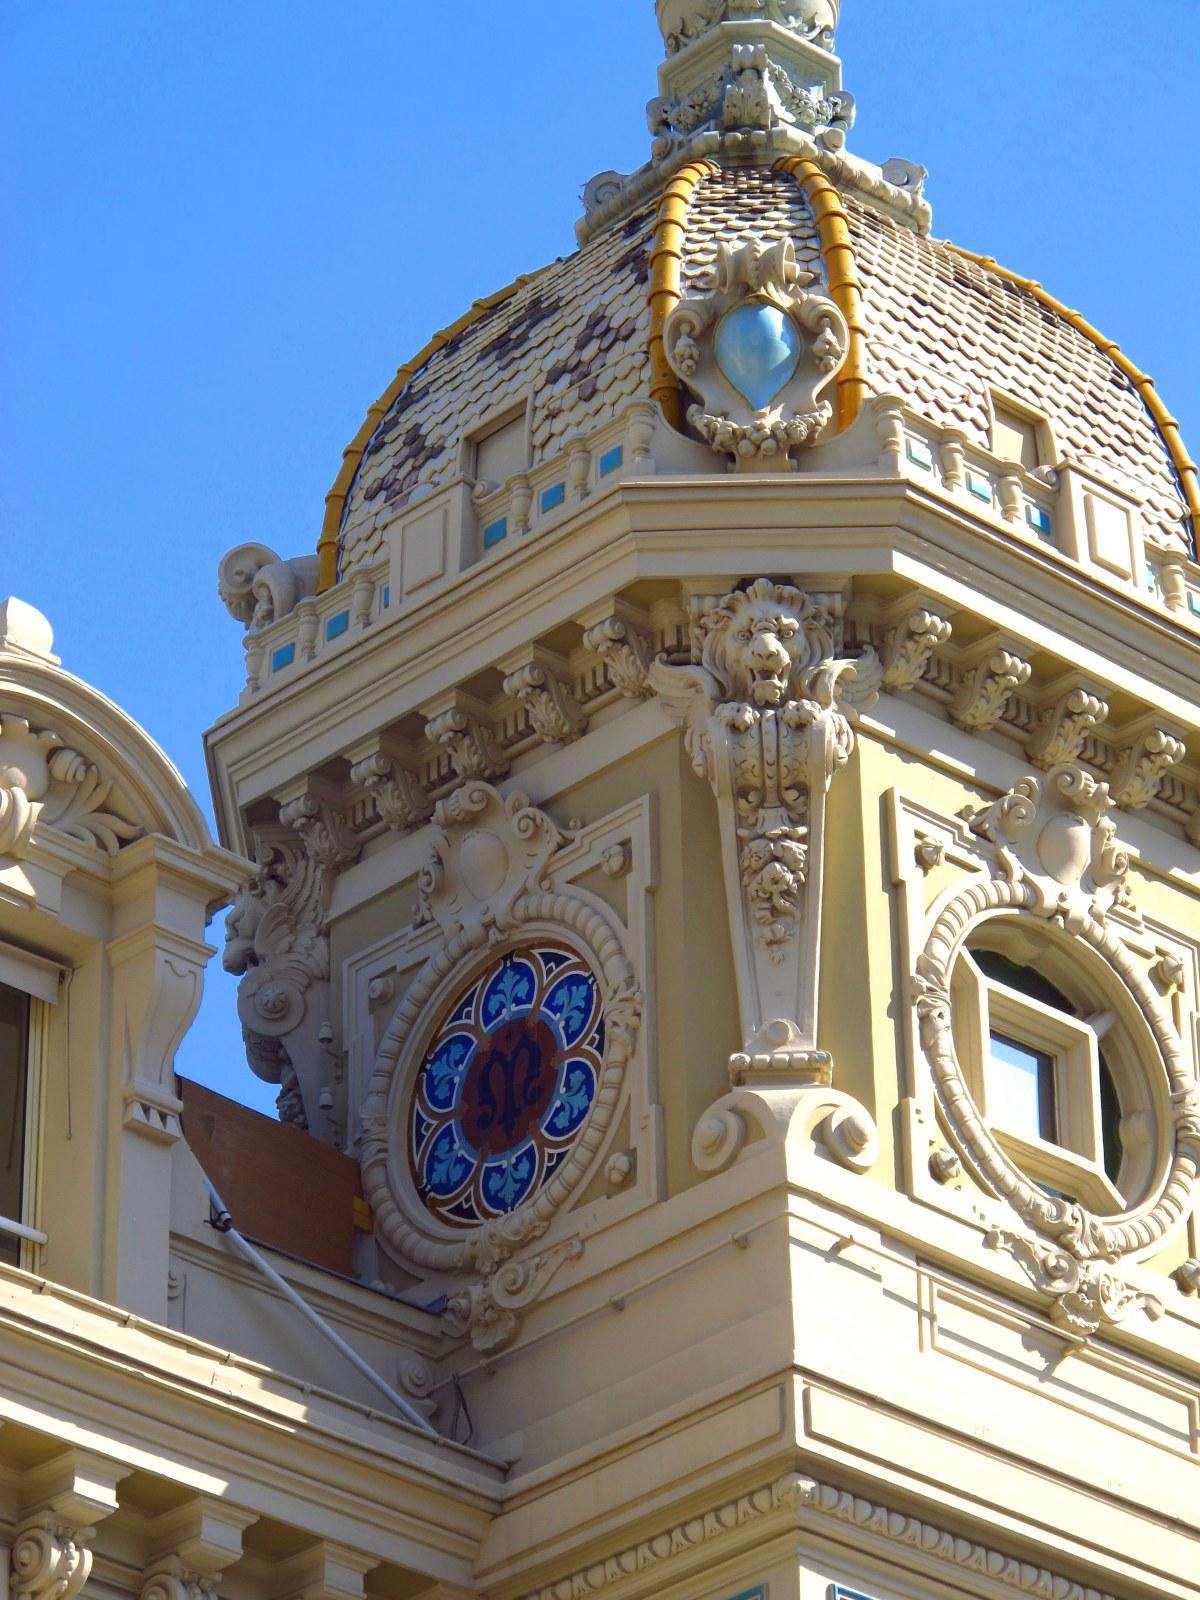 Lunchtime-in-Monte-Carlo-Monaco-20